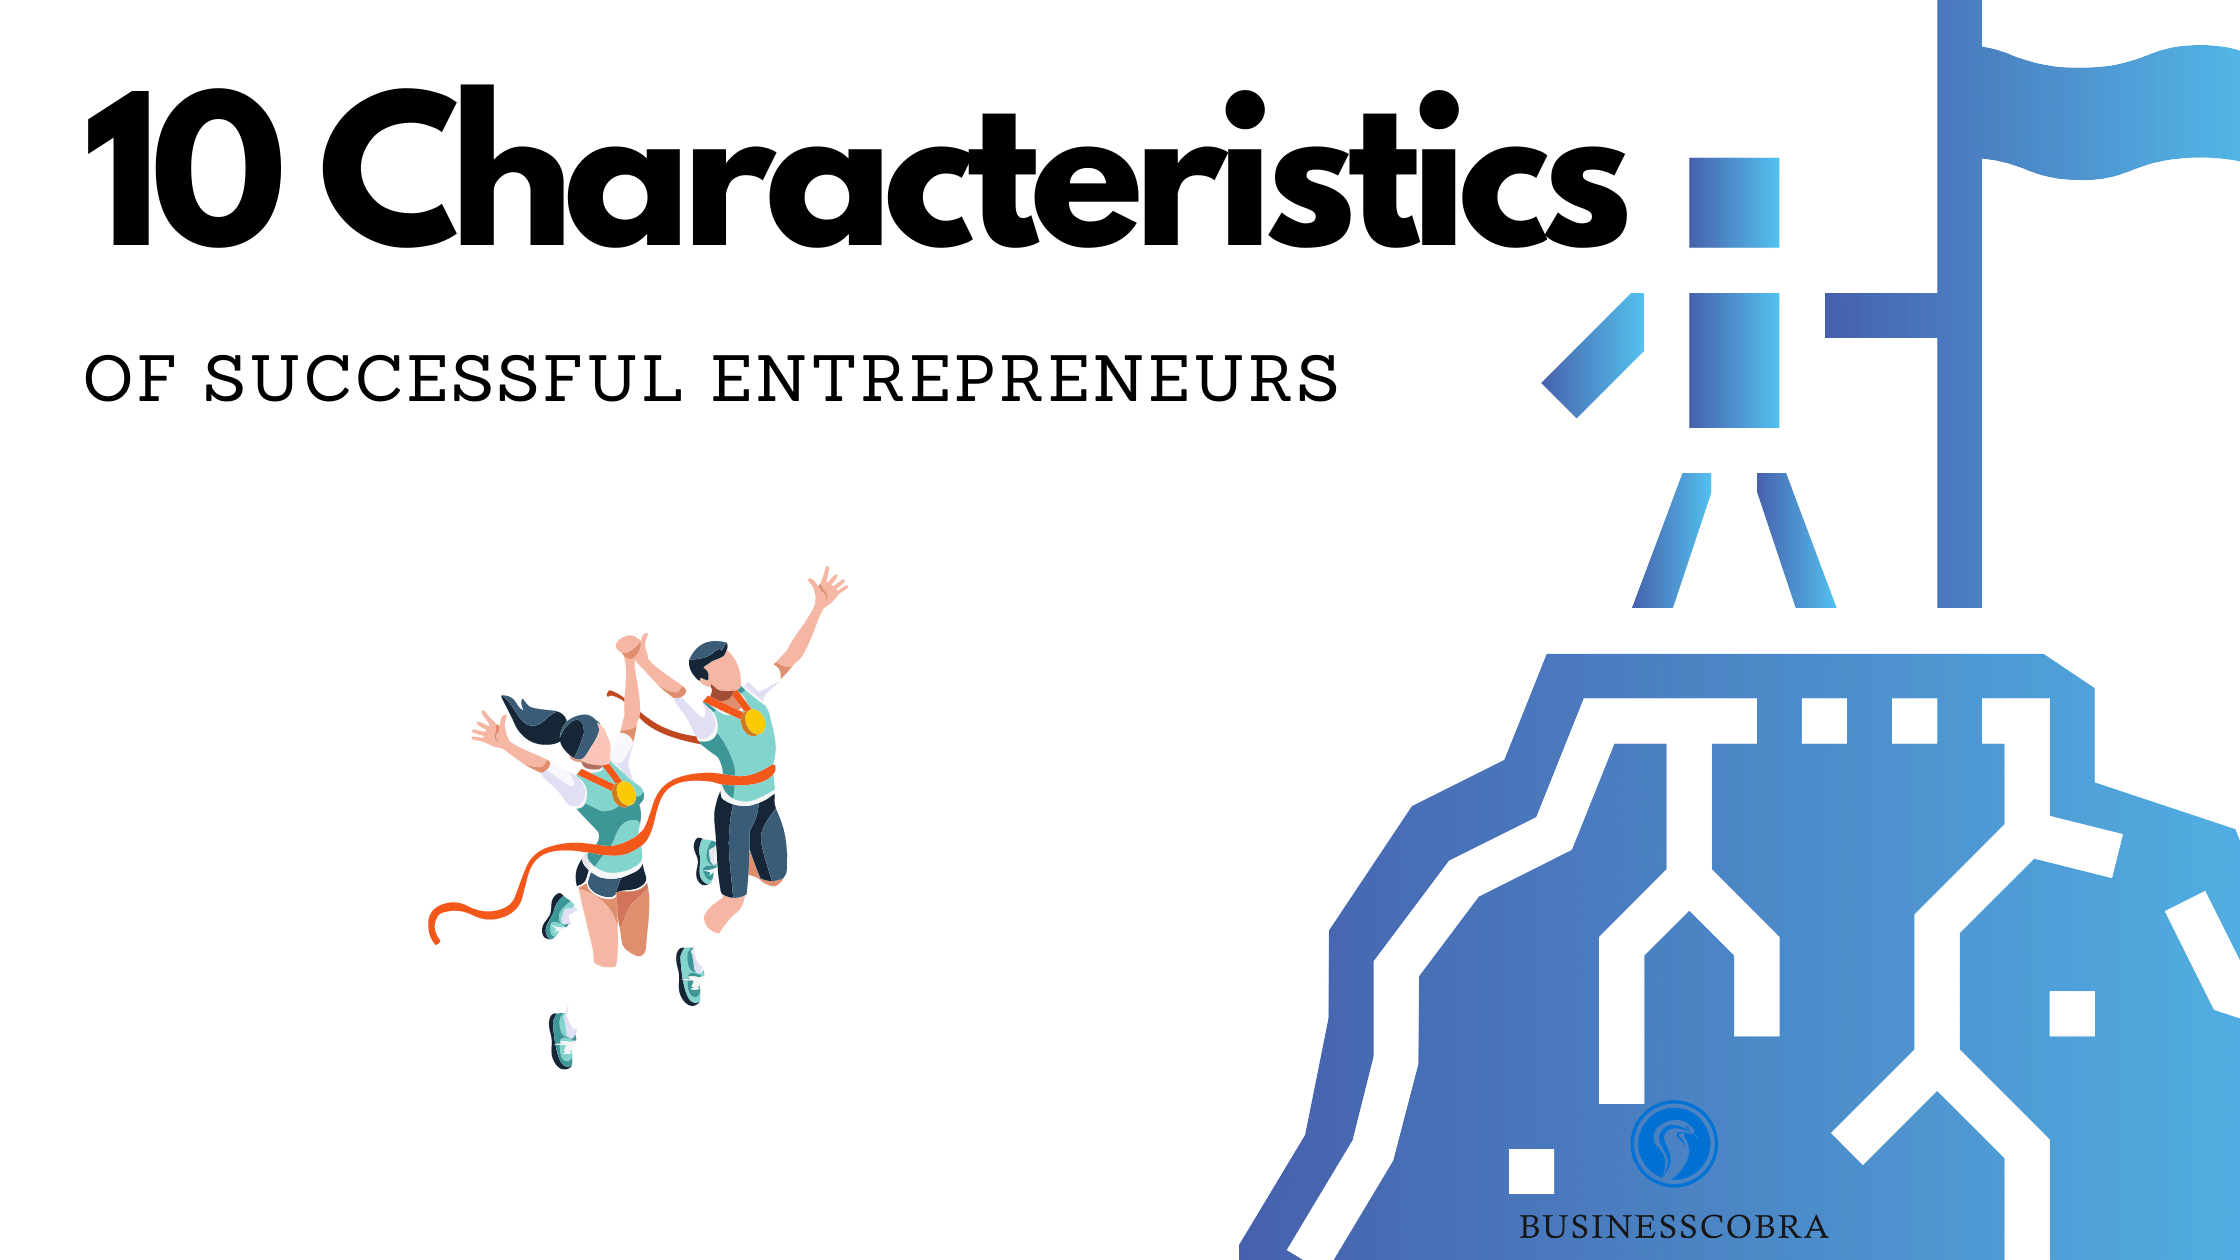 10 Characteristics of successful entrepreneurs